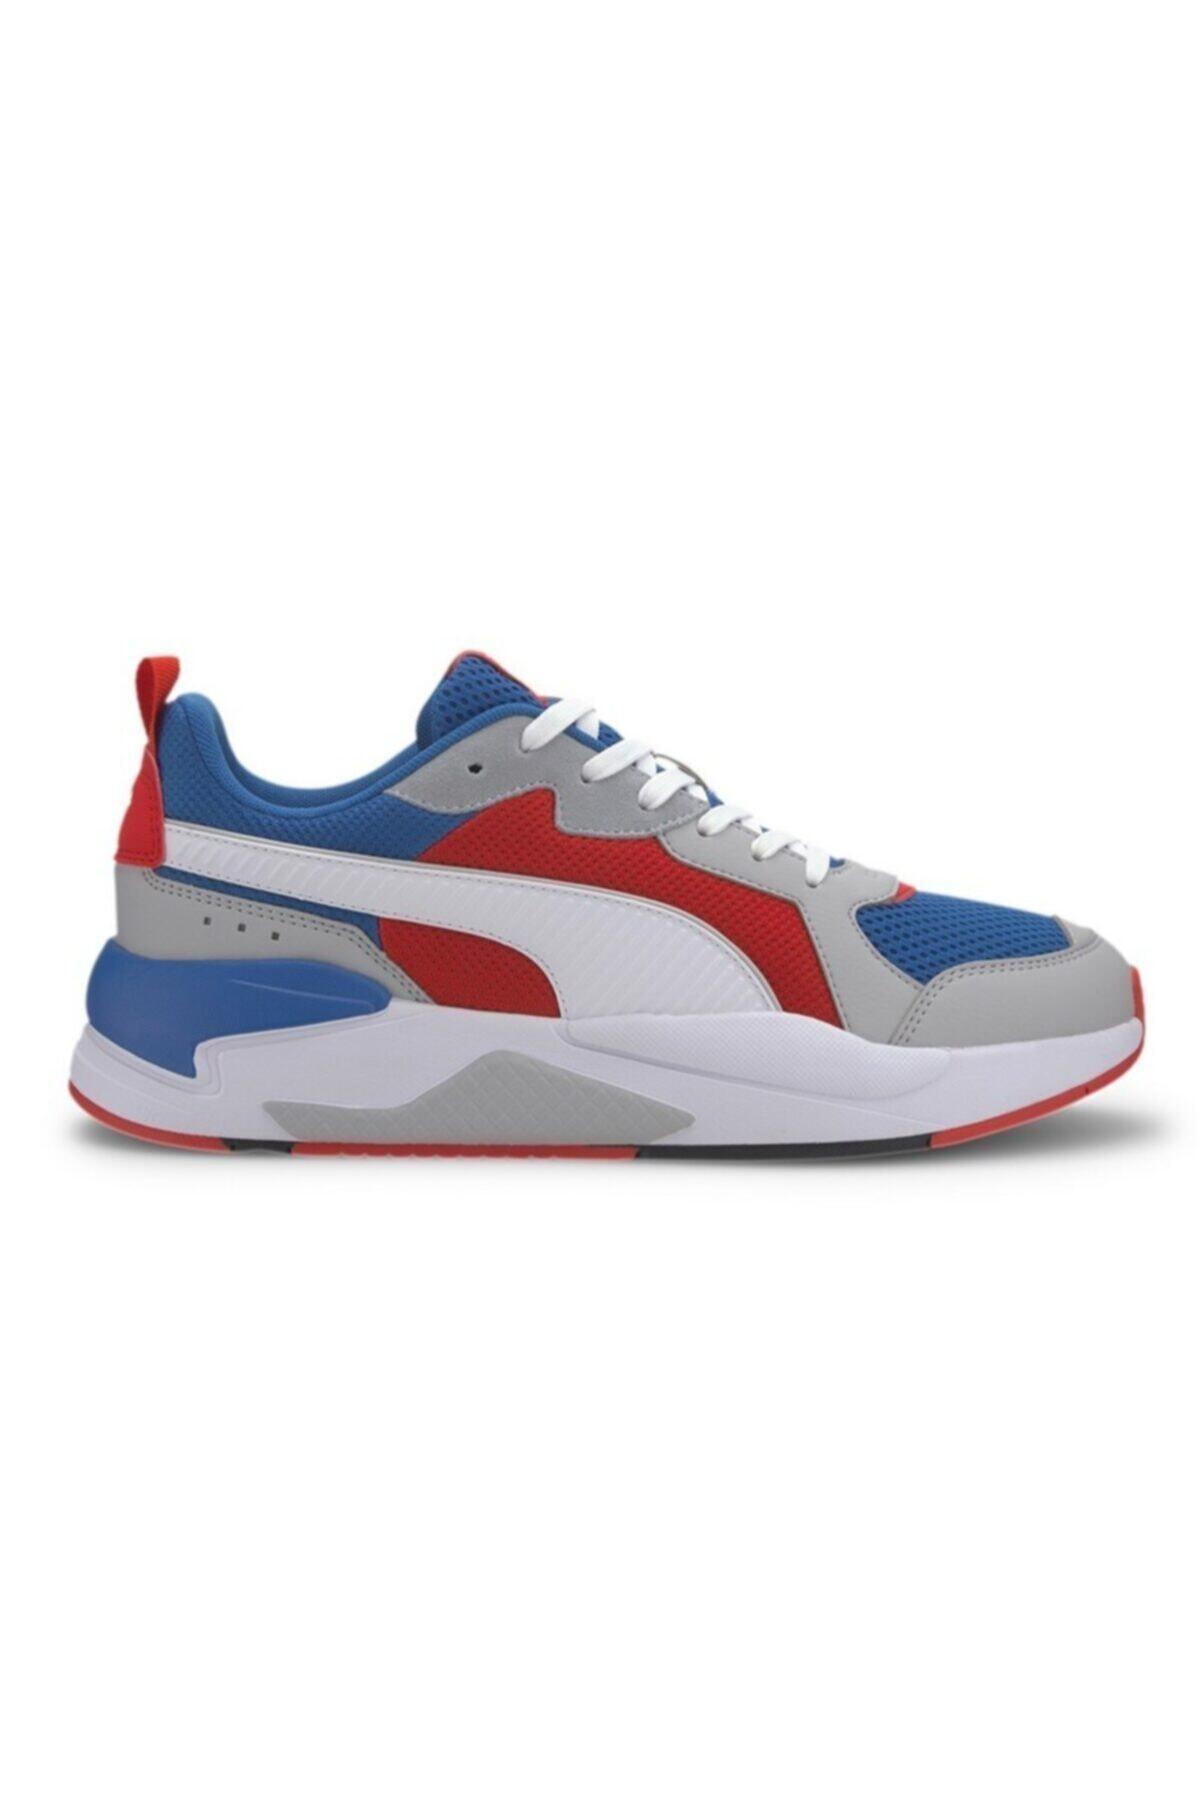 Puma X-RAY Lacivert Erkek Sneaker Ayakkabı 100532369 1